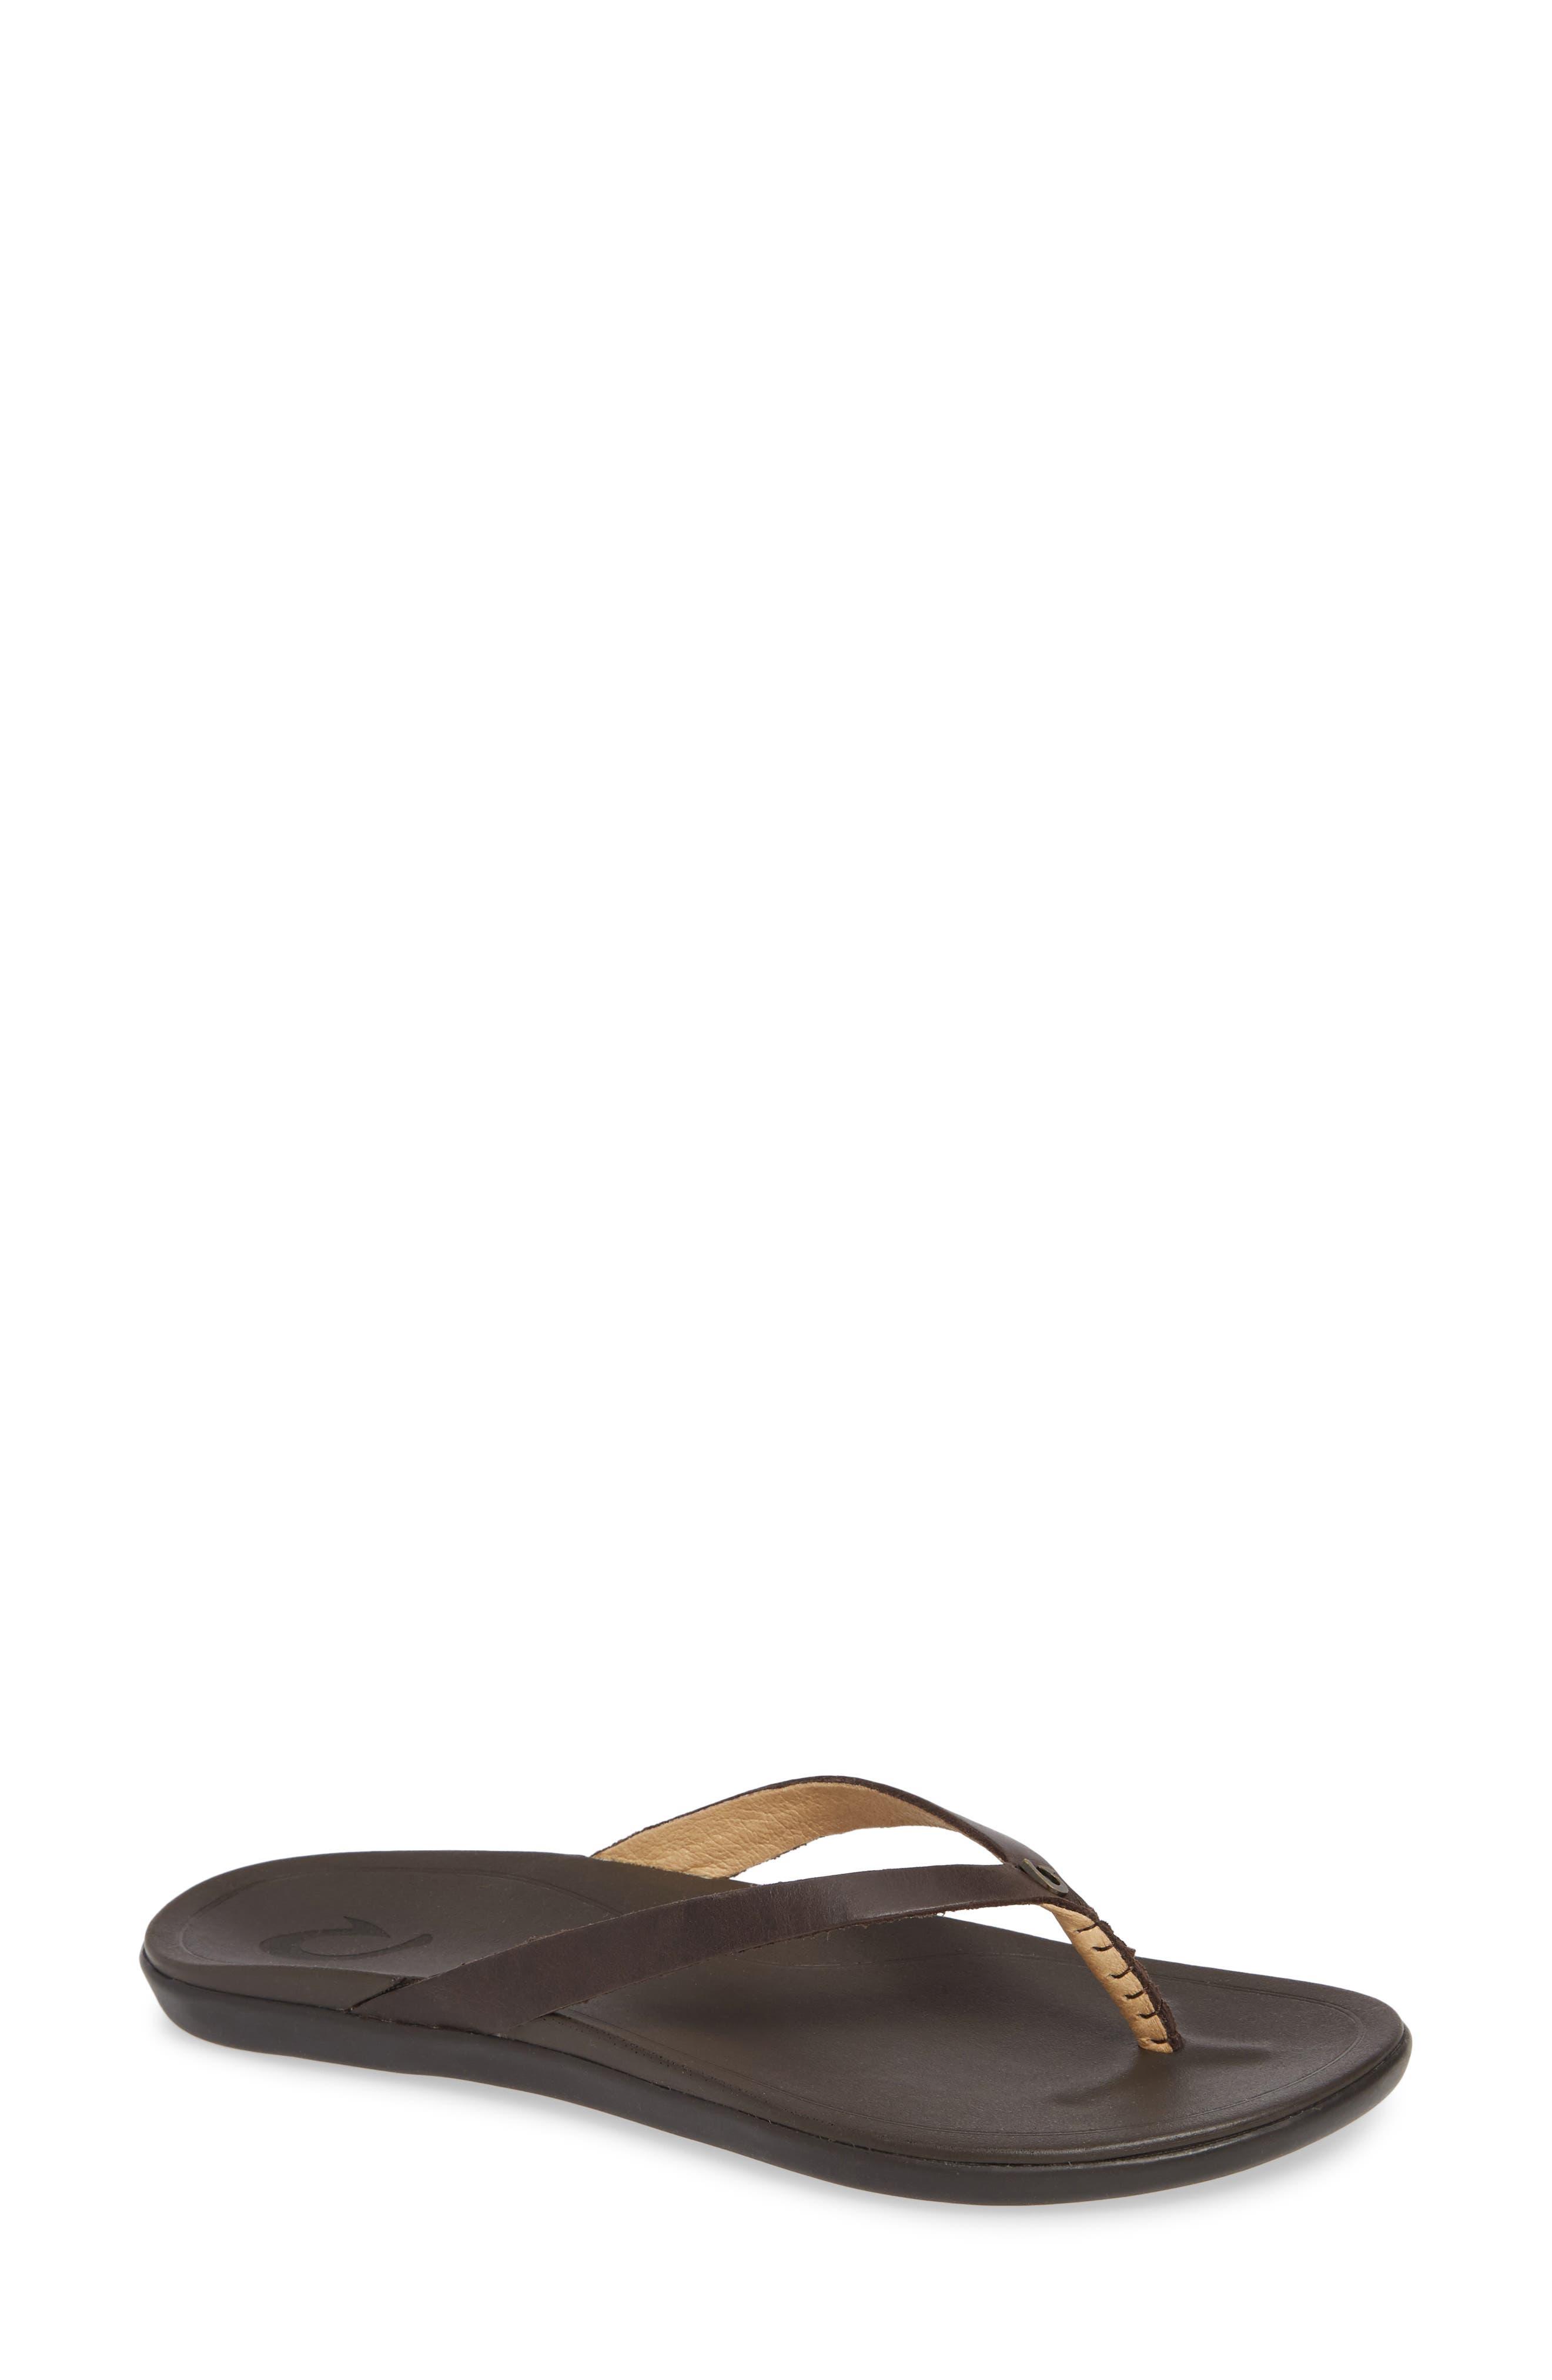 ,                             'Ho Opio' Leather Flip Flop,                             Main thumbnail 1, color,                             DARK JAVA/ DARK JAVA LEATHER